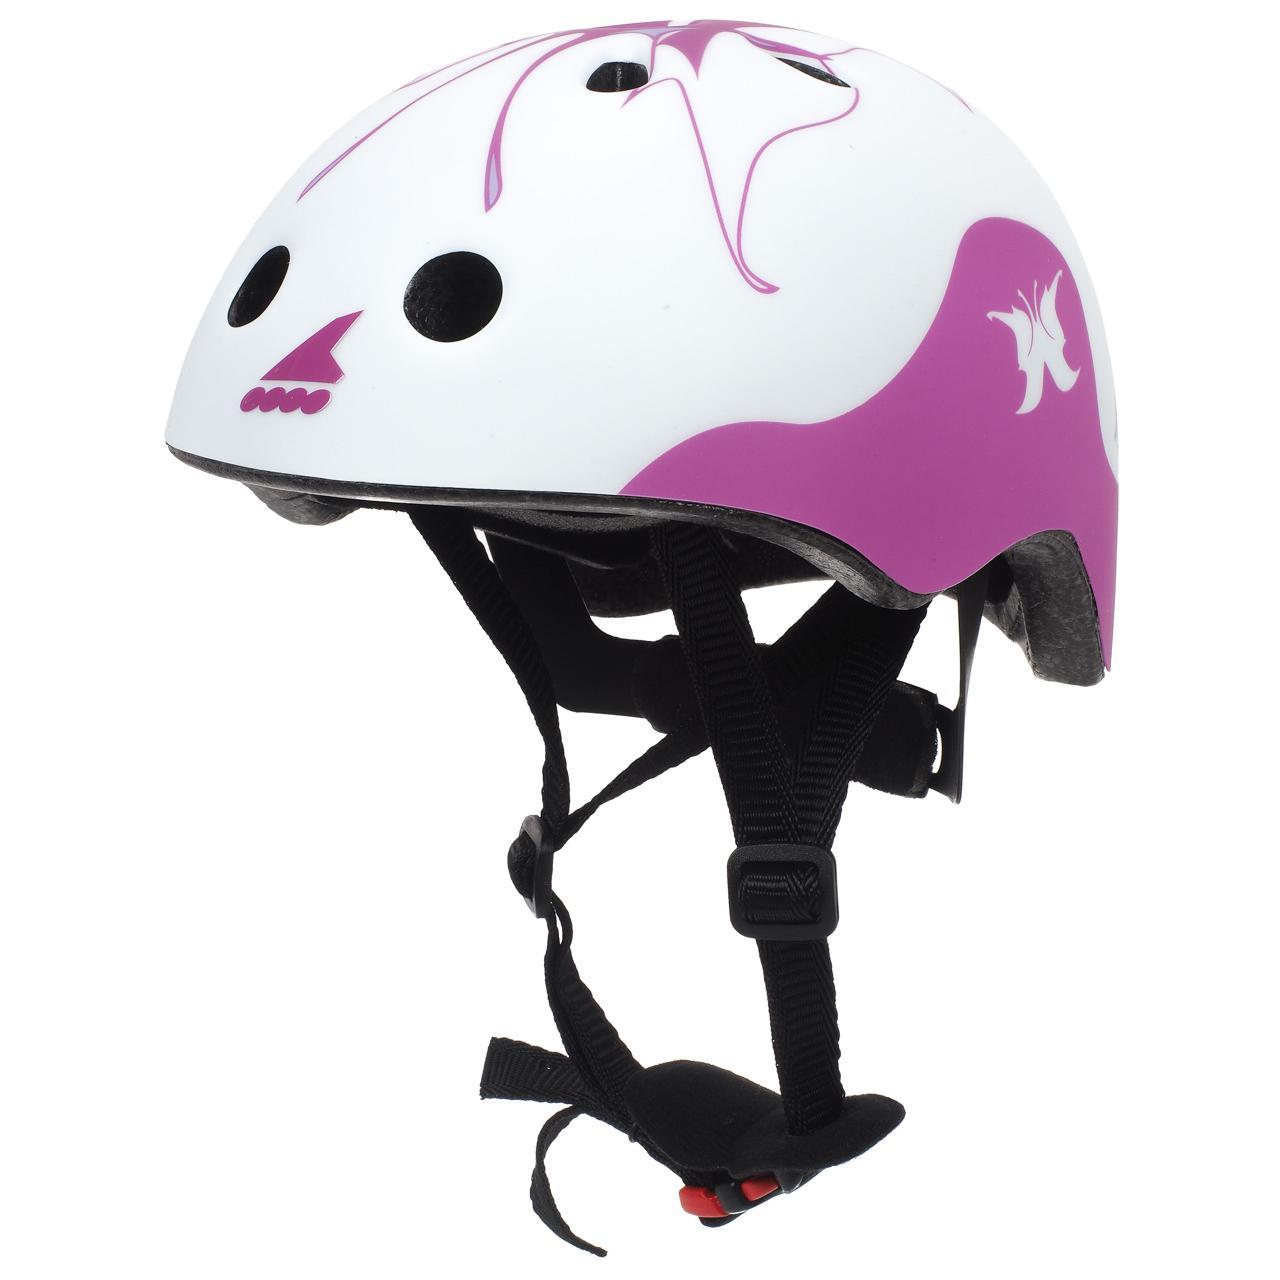 Casque-roller-skate-trotinette-Rollerblade-Twist-jr-blc-casque-Rose-15103-Neuf